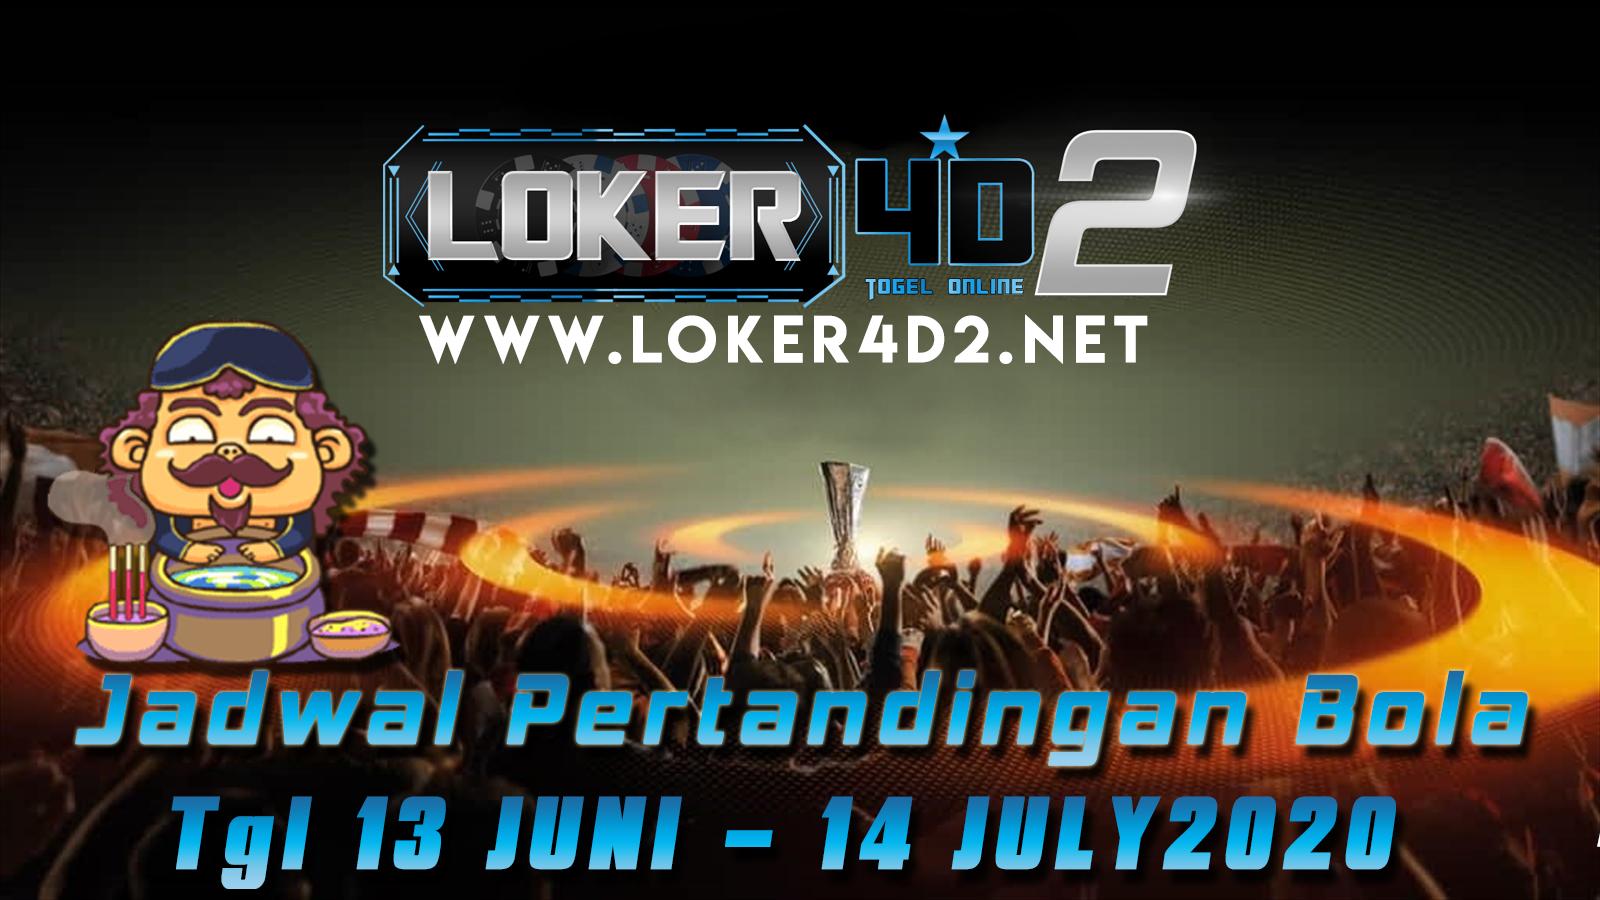 JADWAL PERTANDINGAN BOLA 13-14 JULI 2020